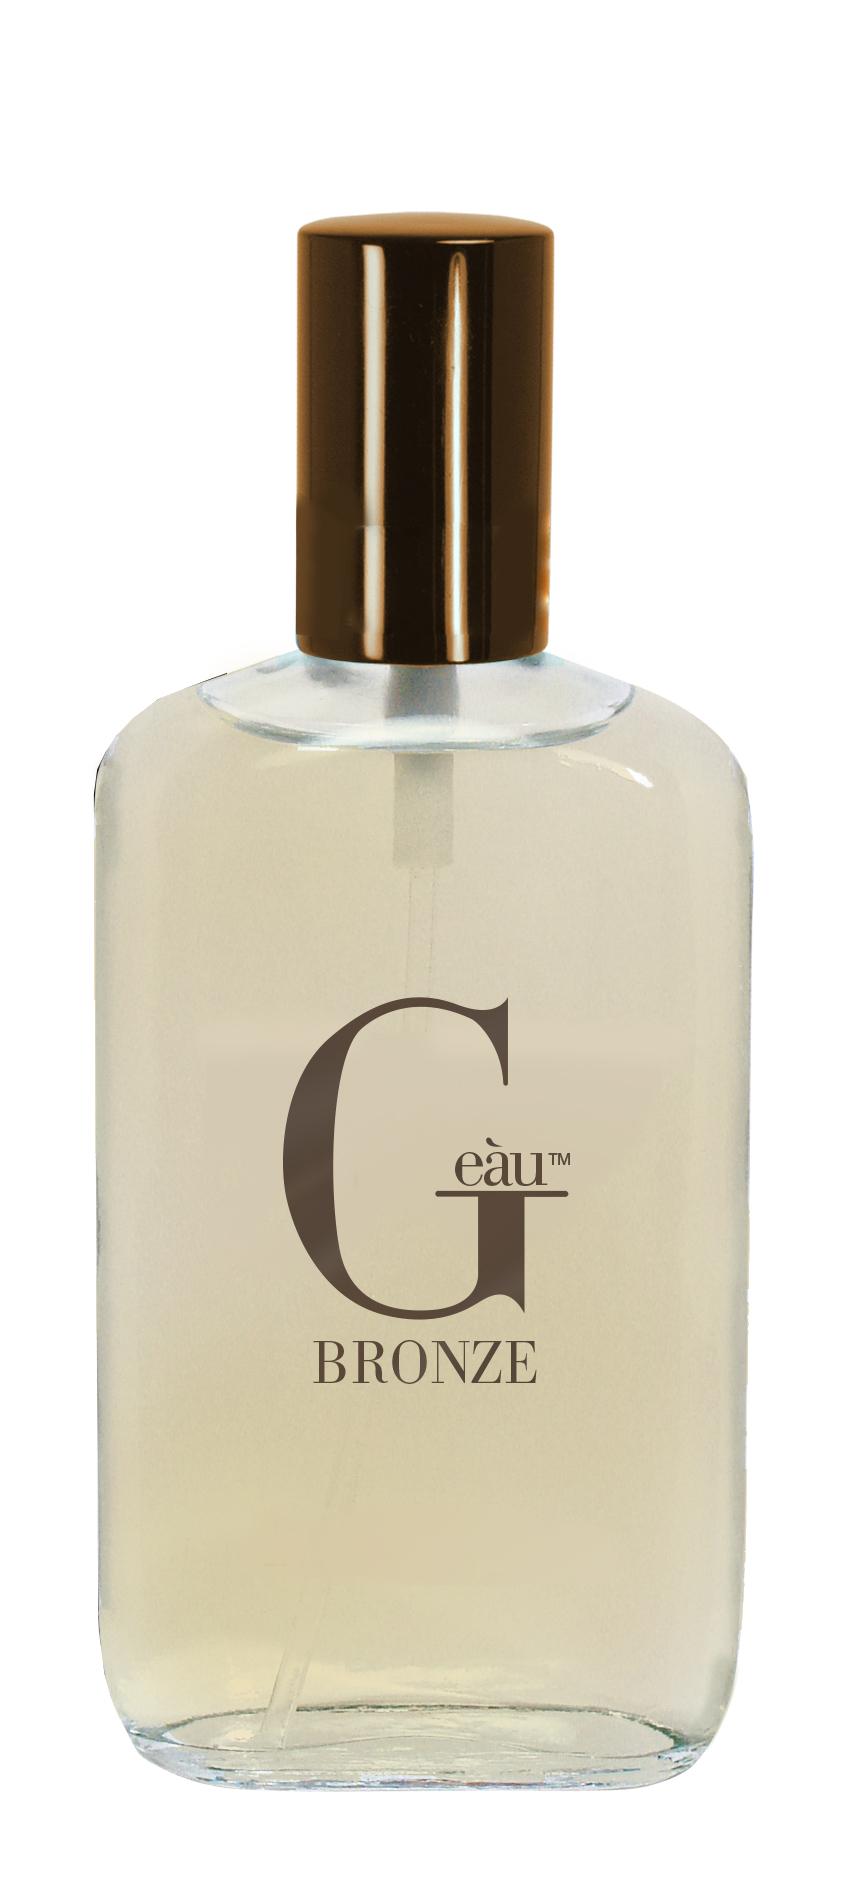 G Eau Bronze, version of Acqua di Gio Absolu*, by PB ParfumsBelcam, Eau de Toilette Spray for Men, 3.4 oz